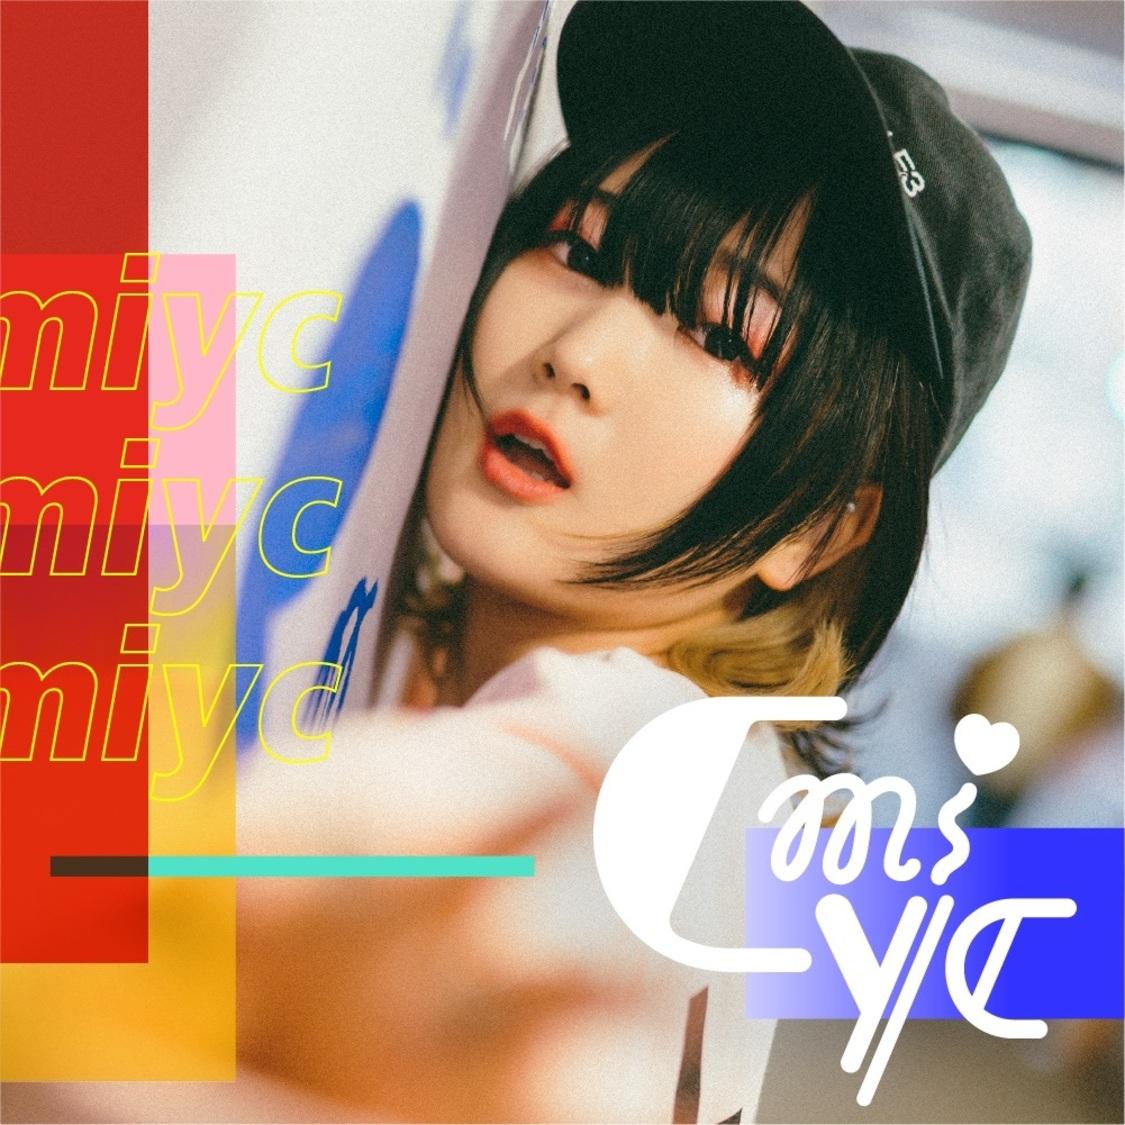 Cmiyc(元コウテカドライ きゃちまいはー)、14日にデビュー! 楽曲配信開始&MV公開